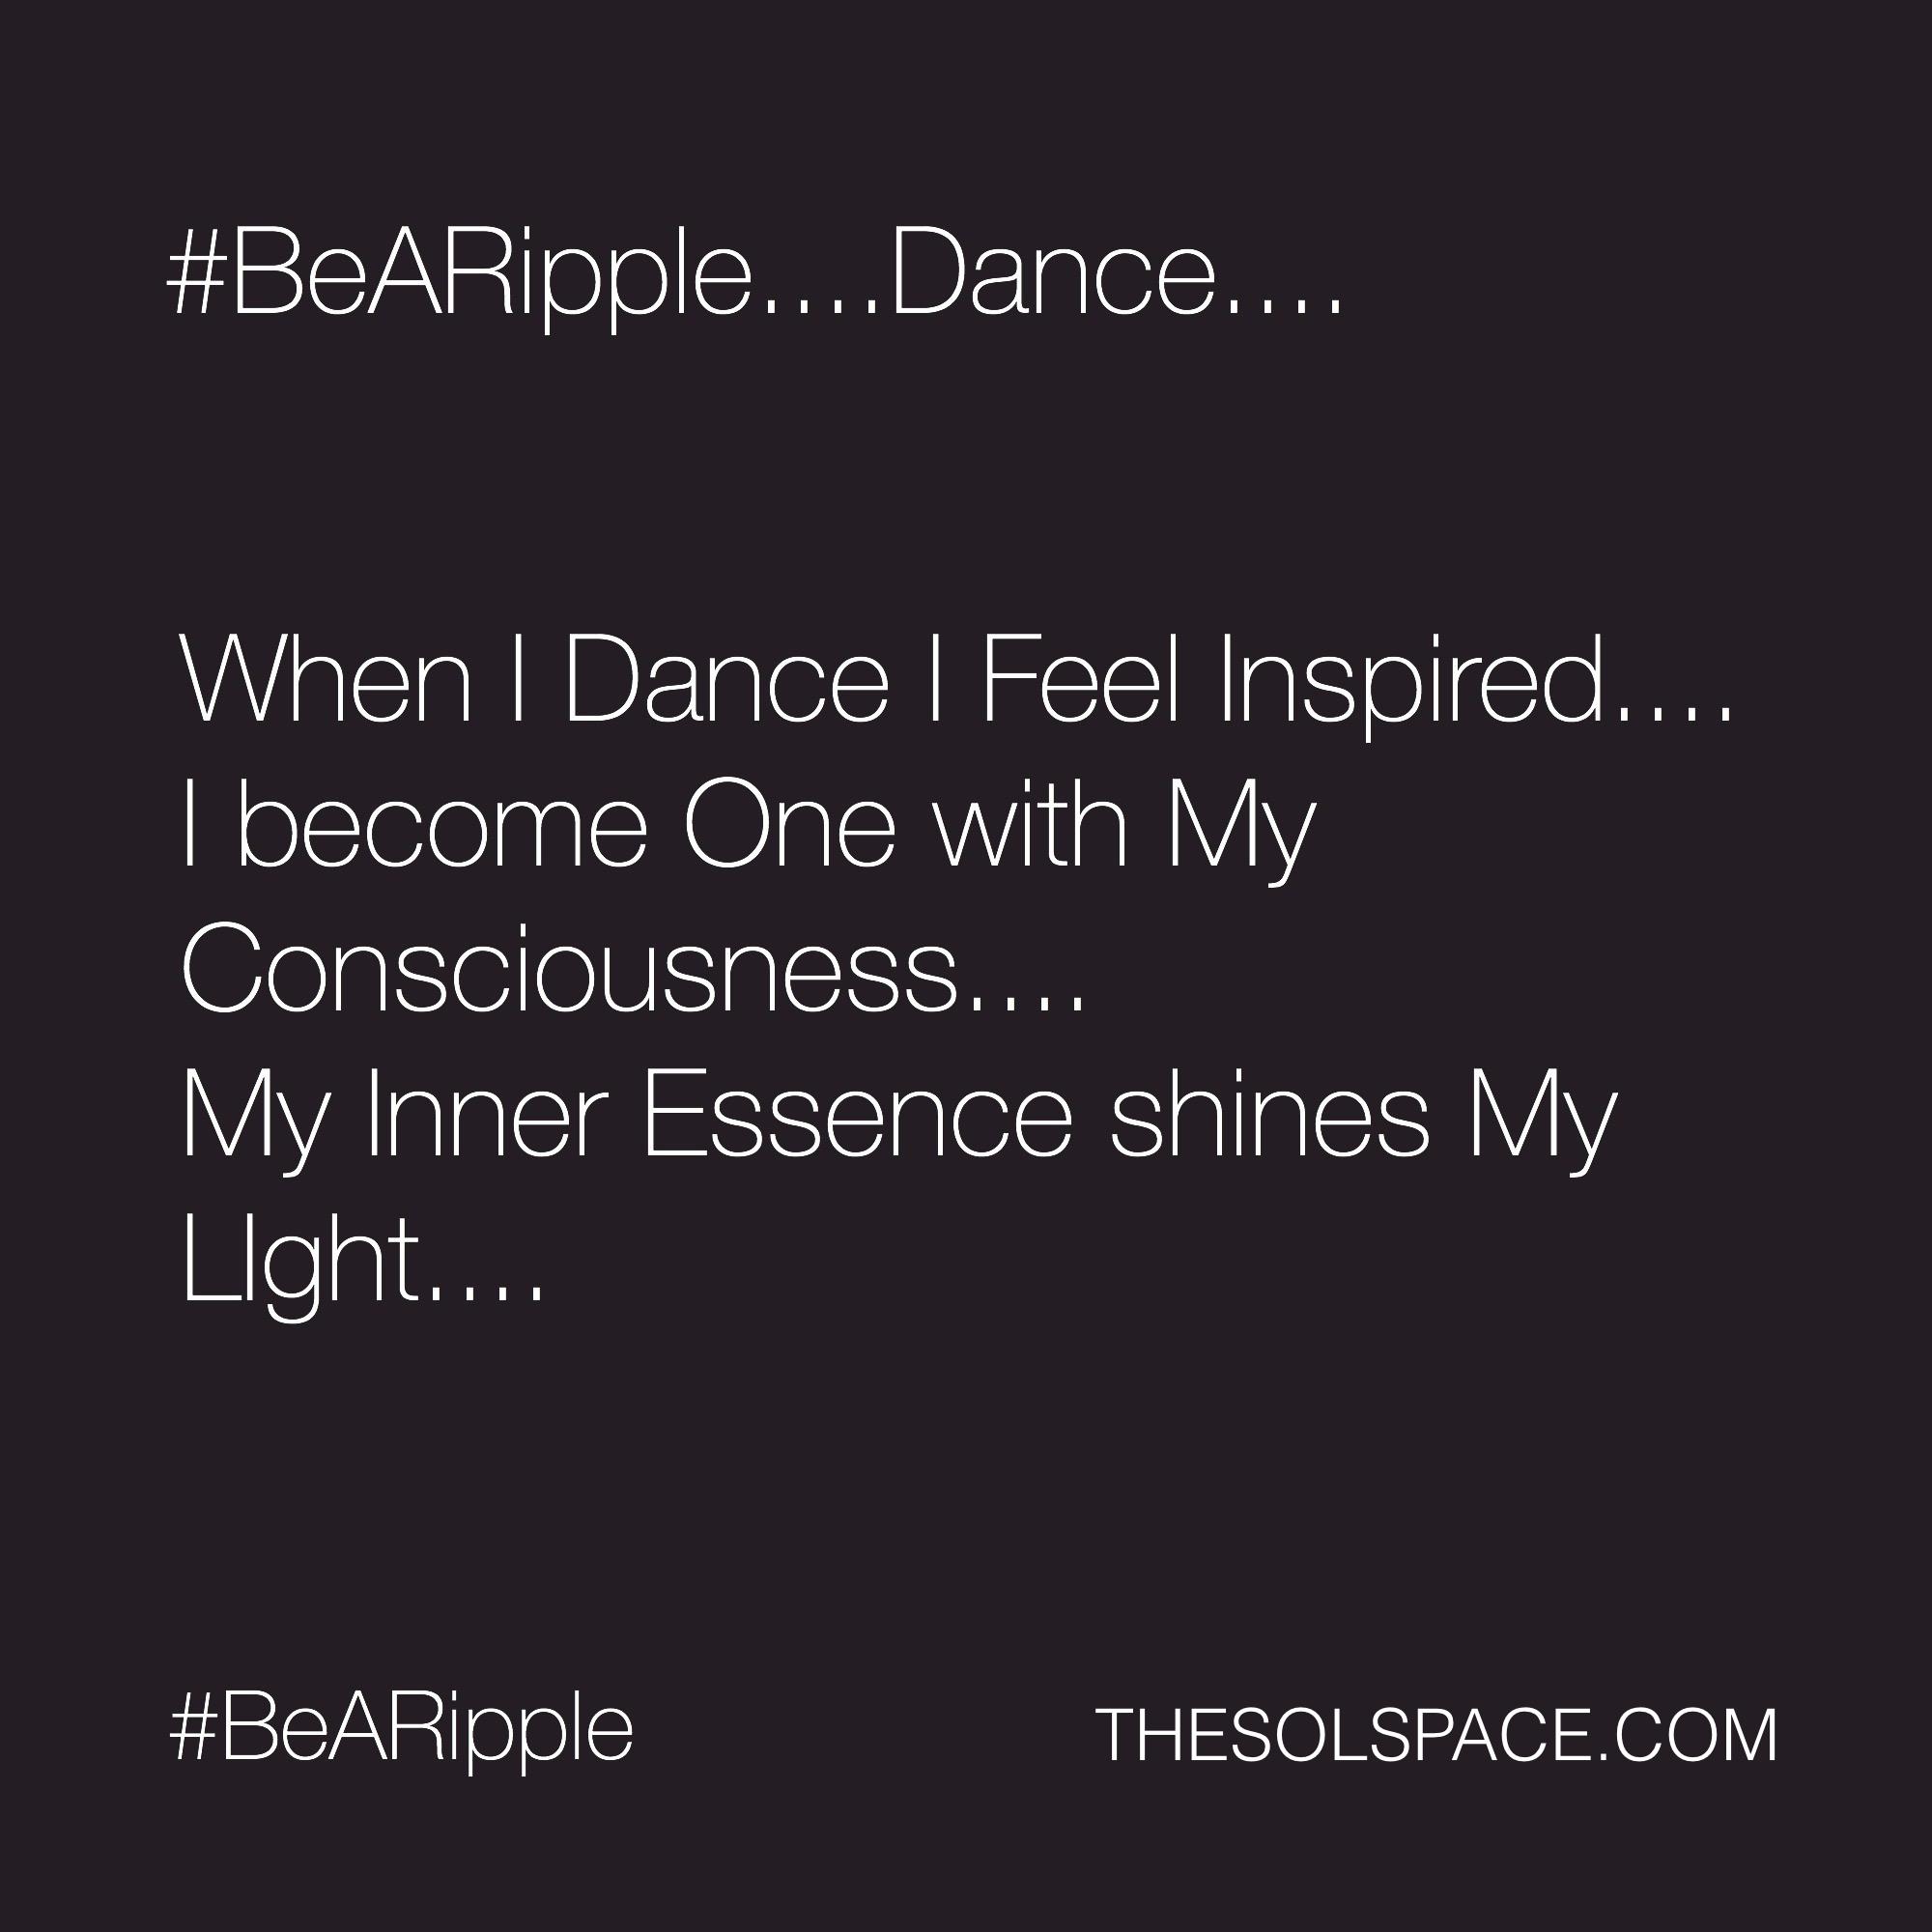 #BeARipple..DANCE...@theSOLspace